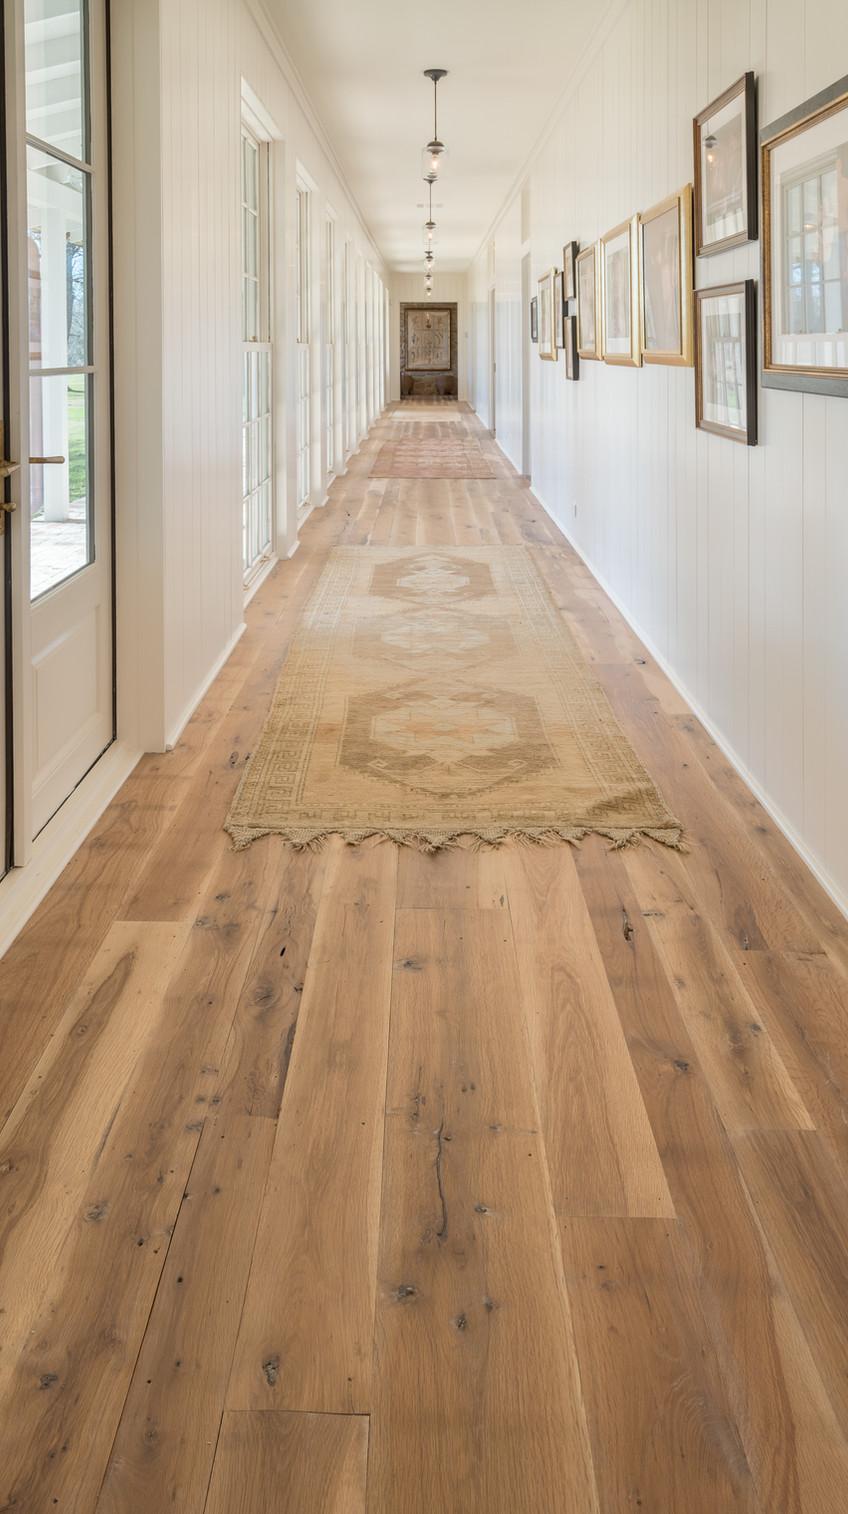 hardwood-design-company-2019-hardwood-flooring-trends-wide-plank-hardwood-flooring-texas-post-oak-hardwood-flooring-oil-finish-hardwood-floors